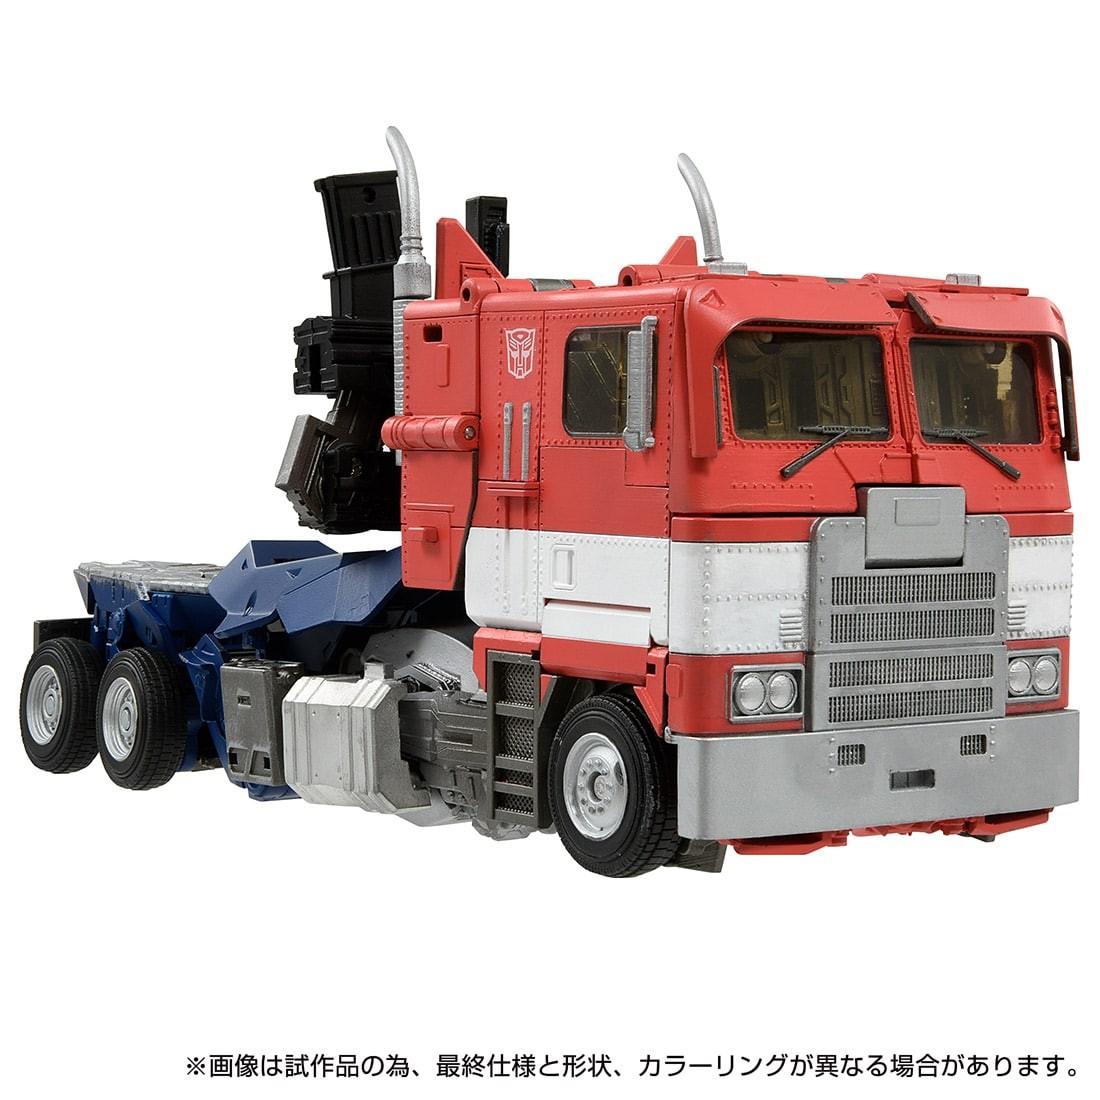 Transformers News: New MPM-12 Bumblebee Optimus Prime Movie Still Images